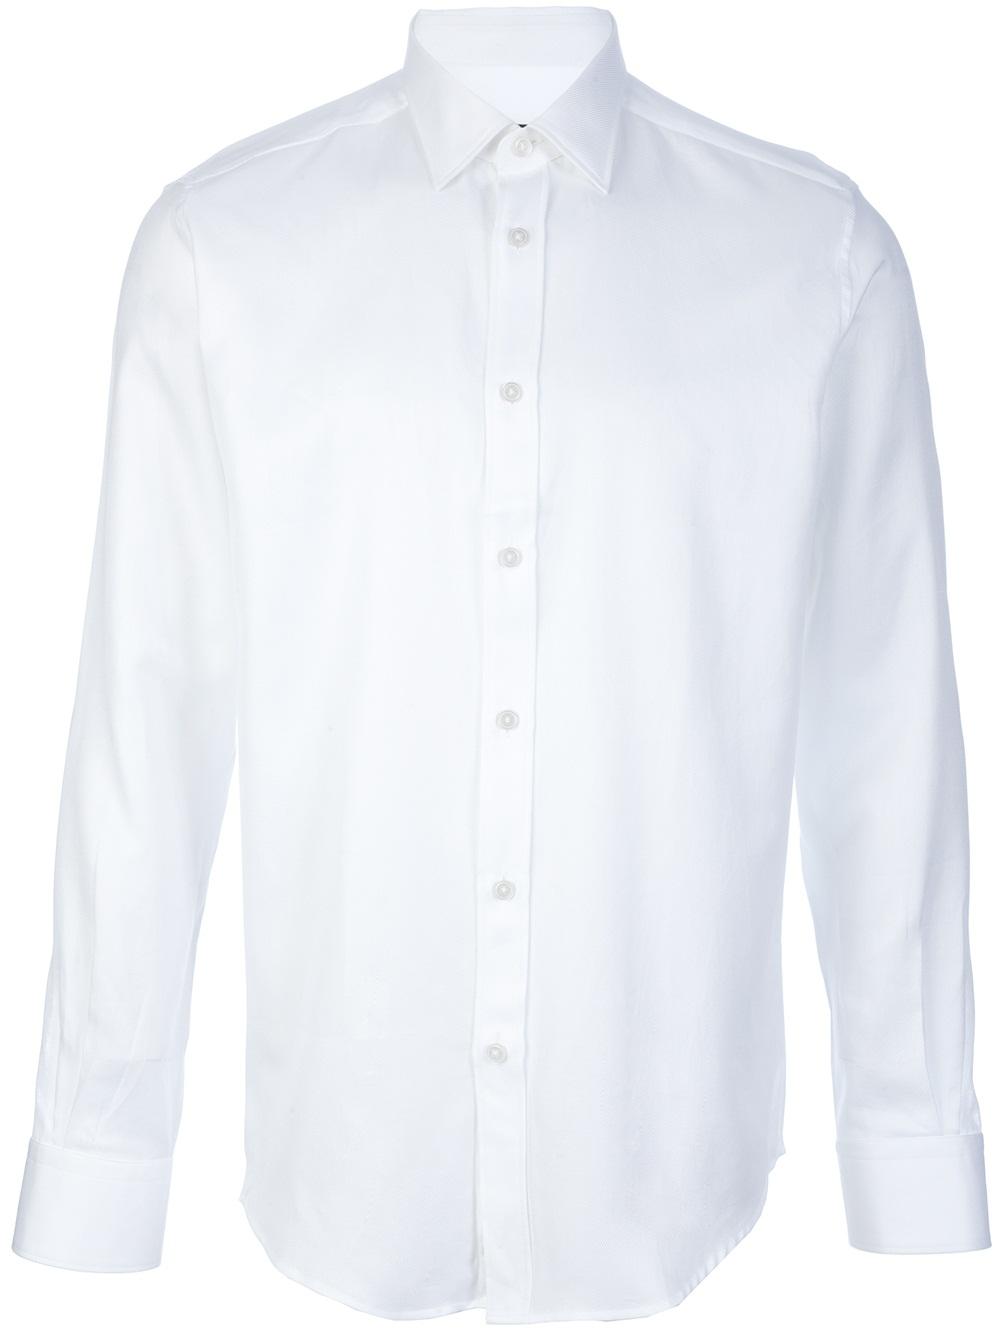 plain button down shirt custom shirt